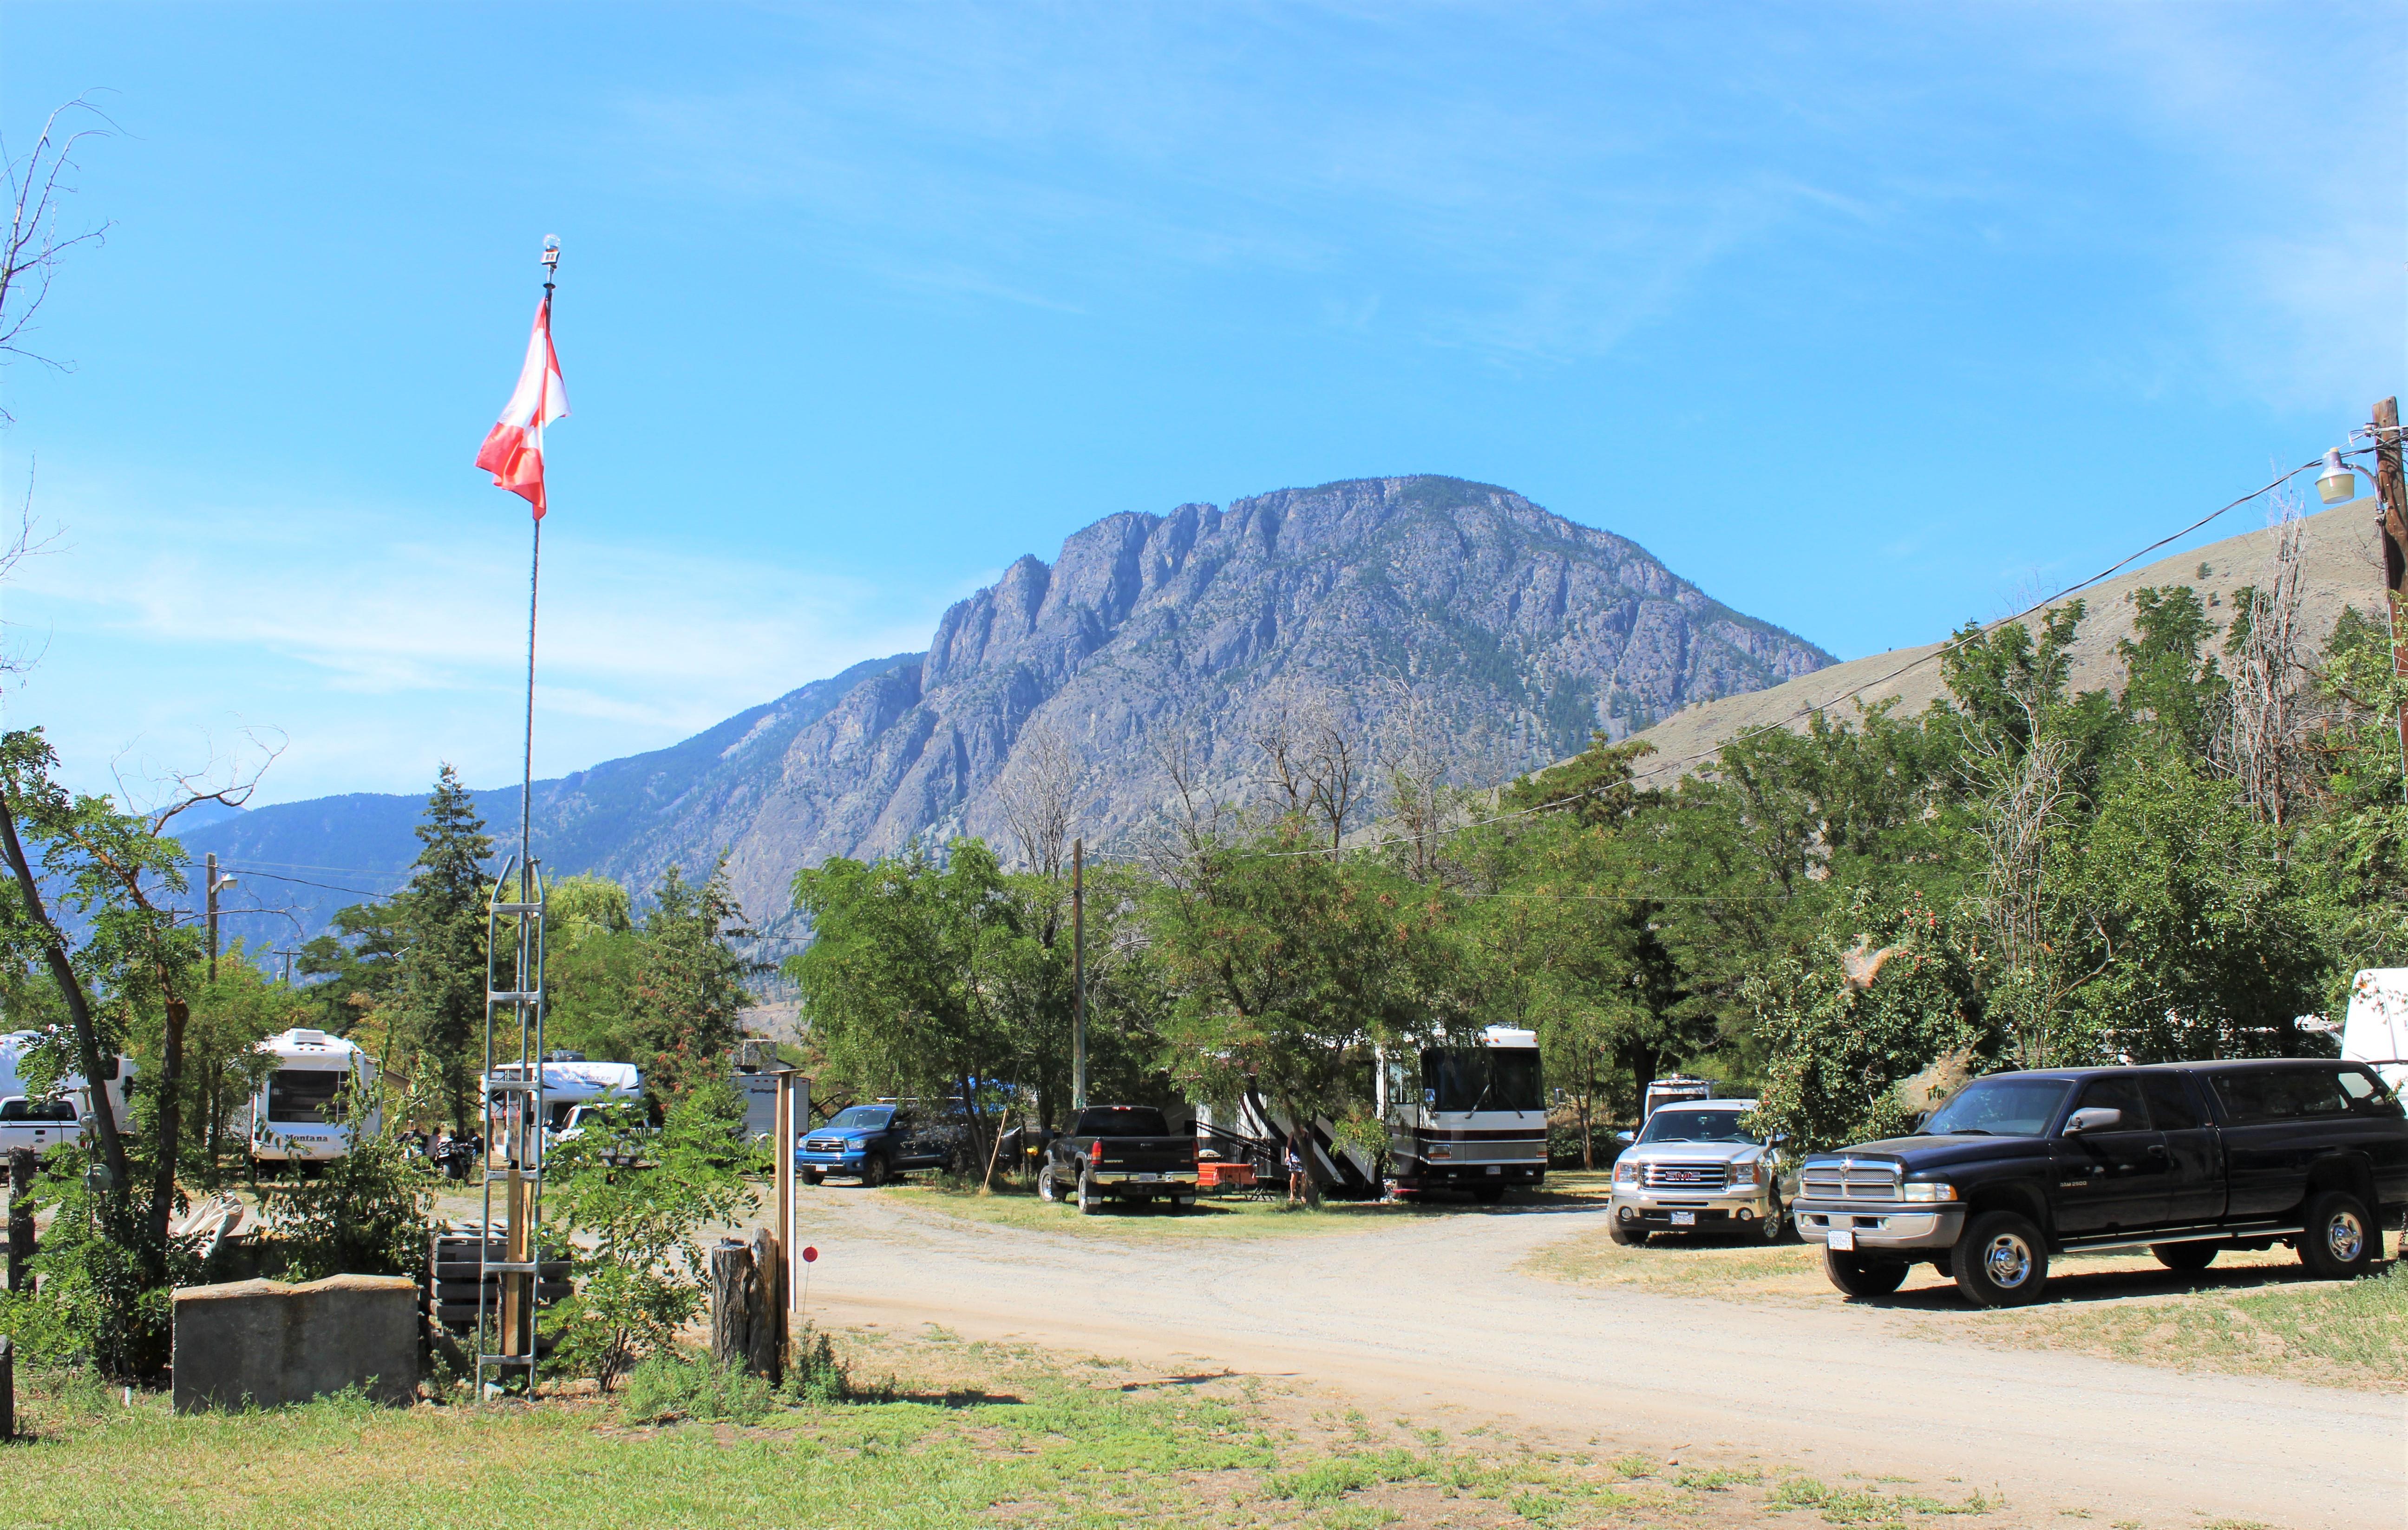 https://0901.nccdn.net/4_2/000/000/046/6ea/campsite-picture-4.jpg